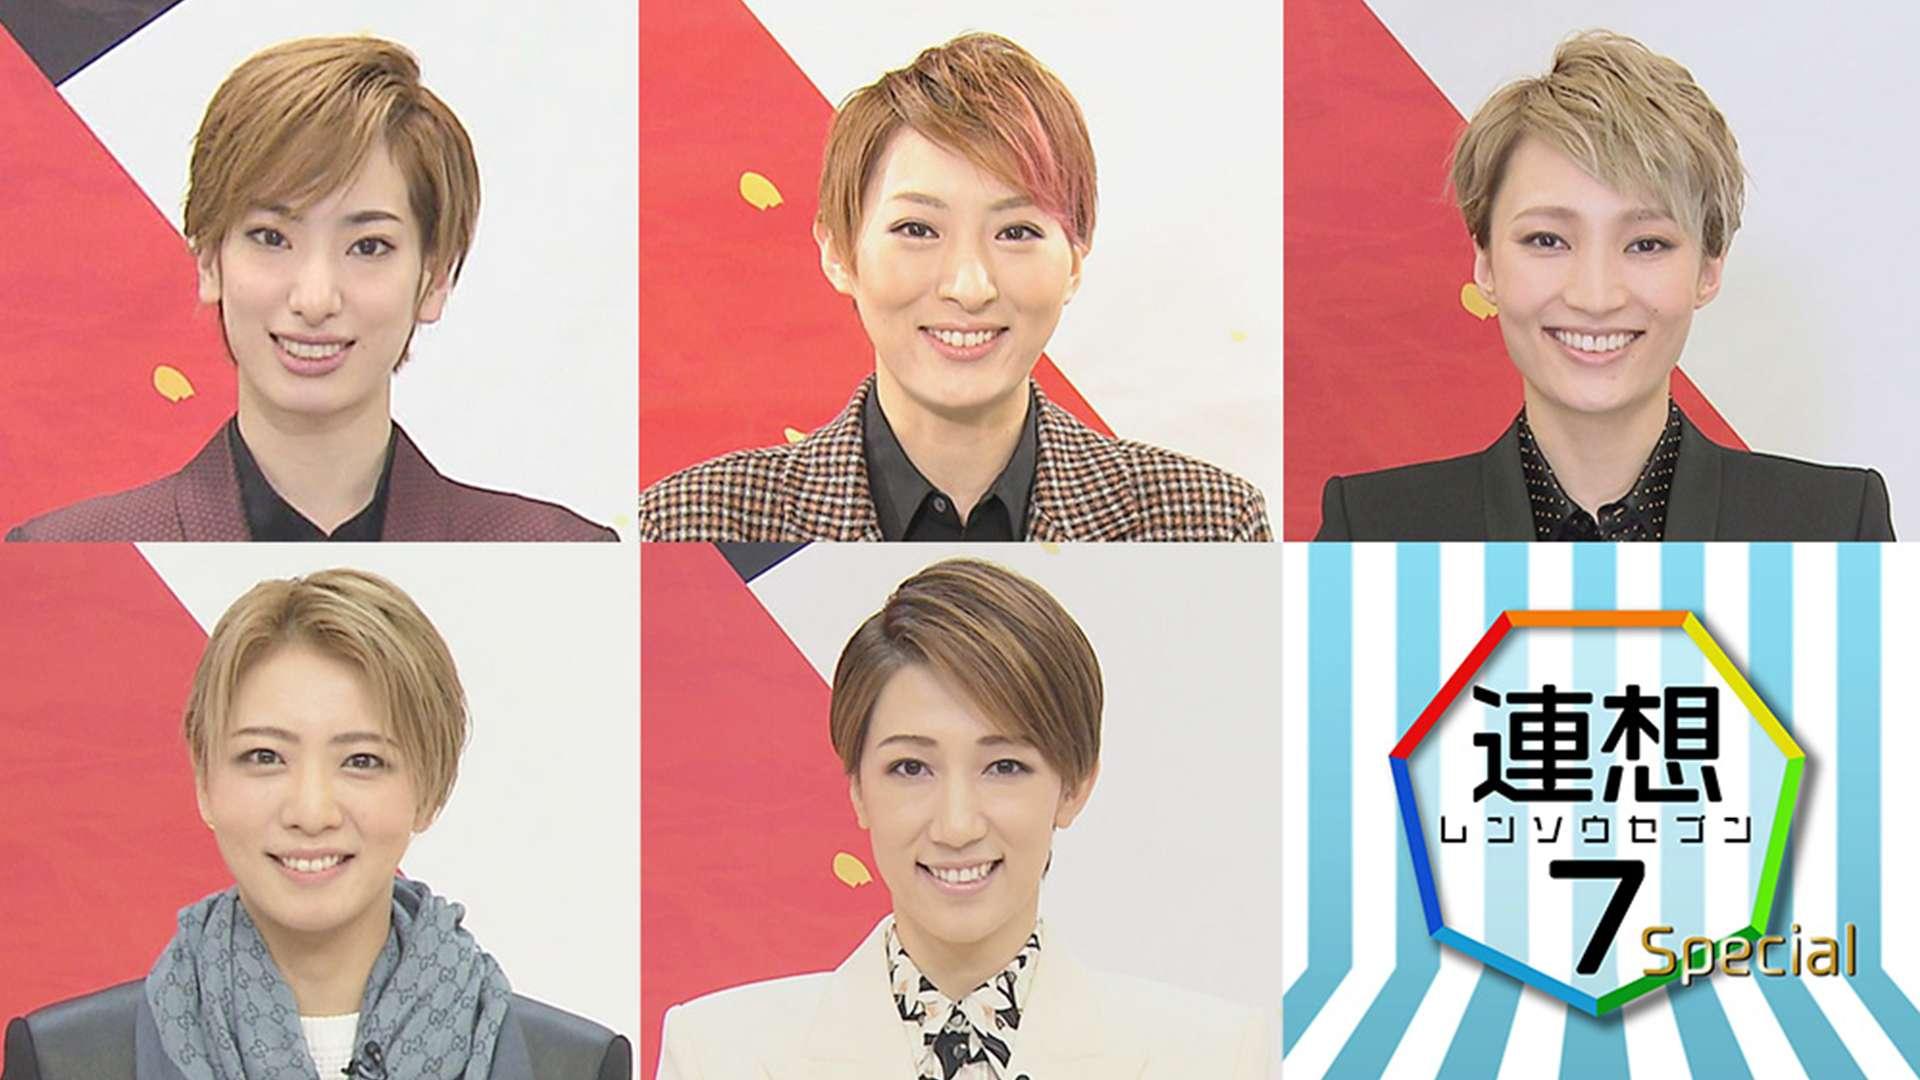 TAKARAZUKA NEWS Pick Up 「連想7 Special」~タカラヅカニュースお正月スペシャル!2021より~